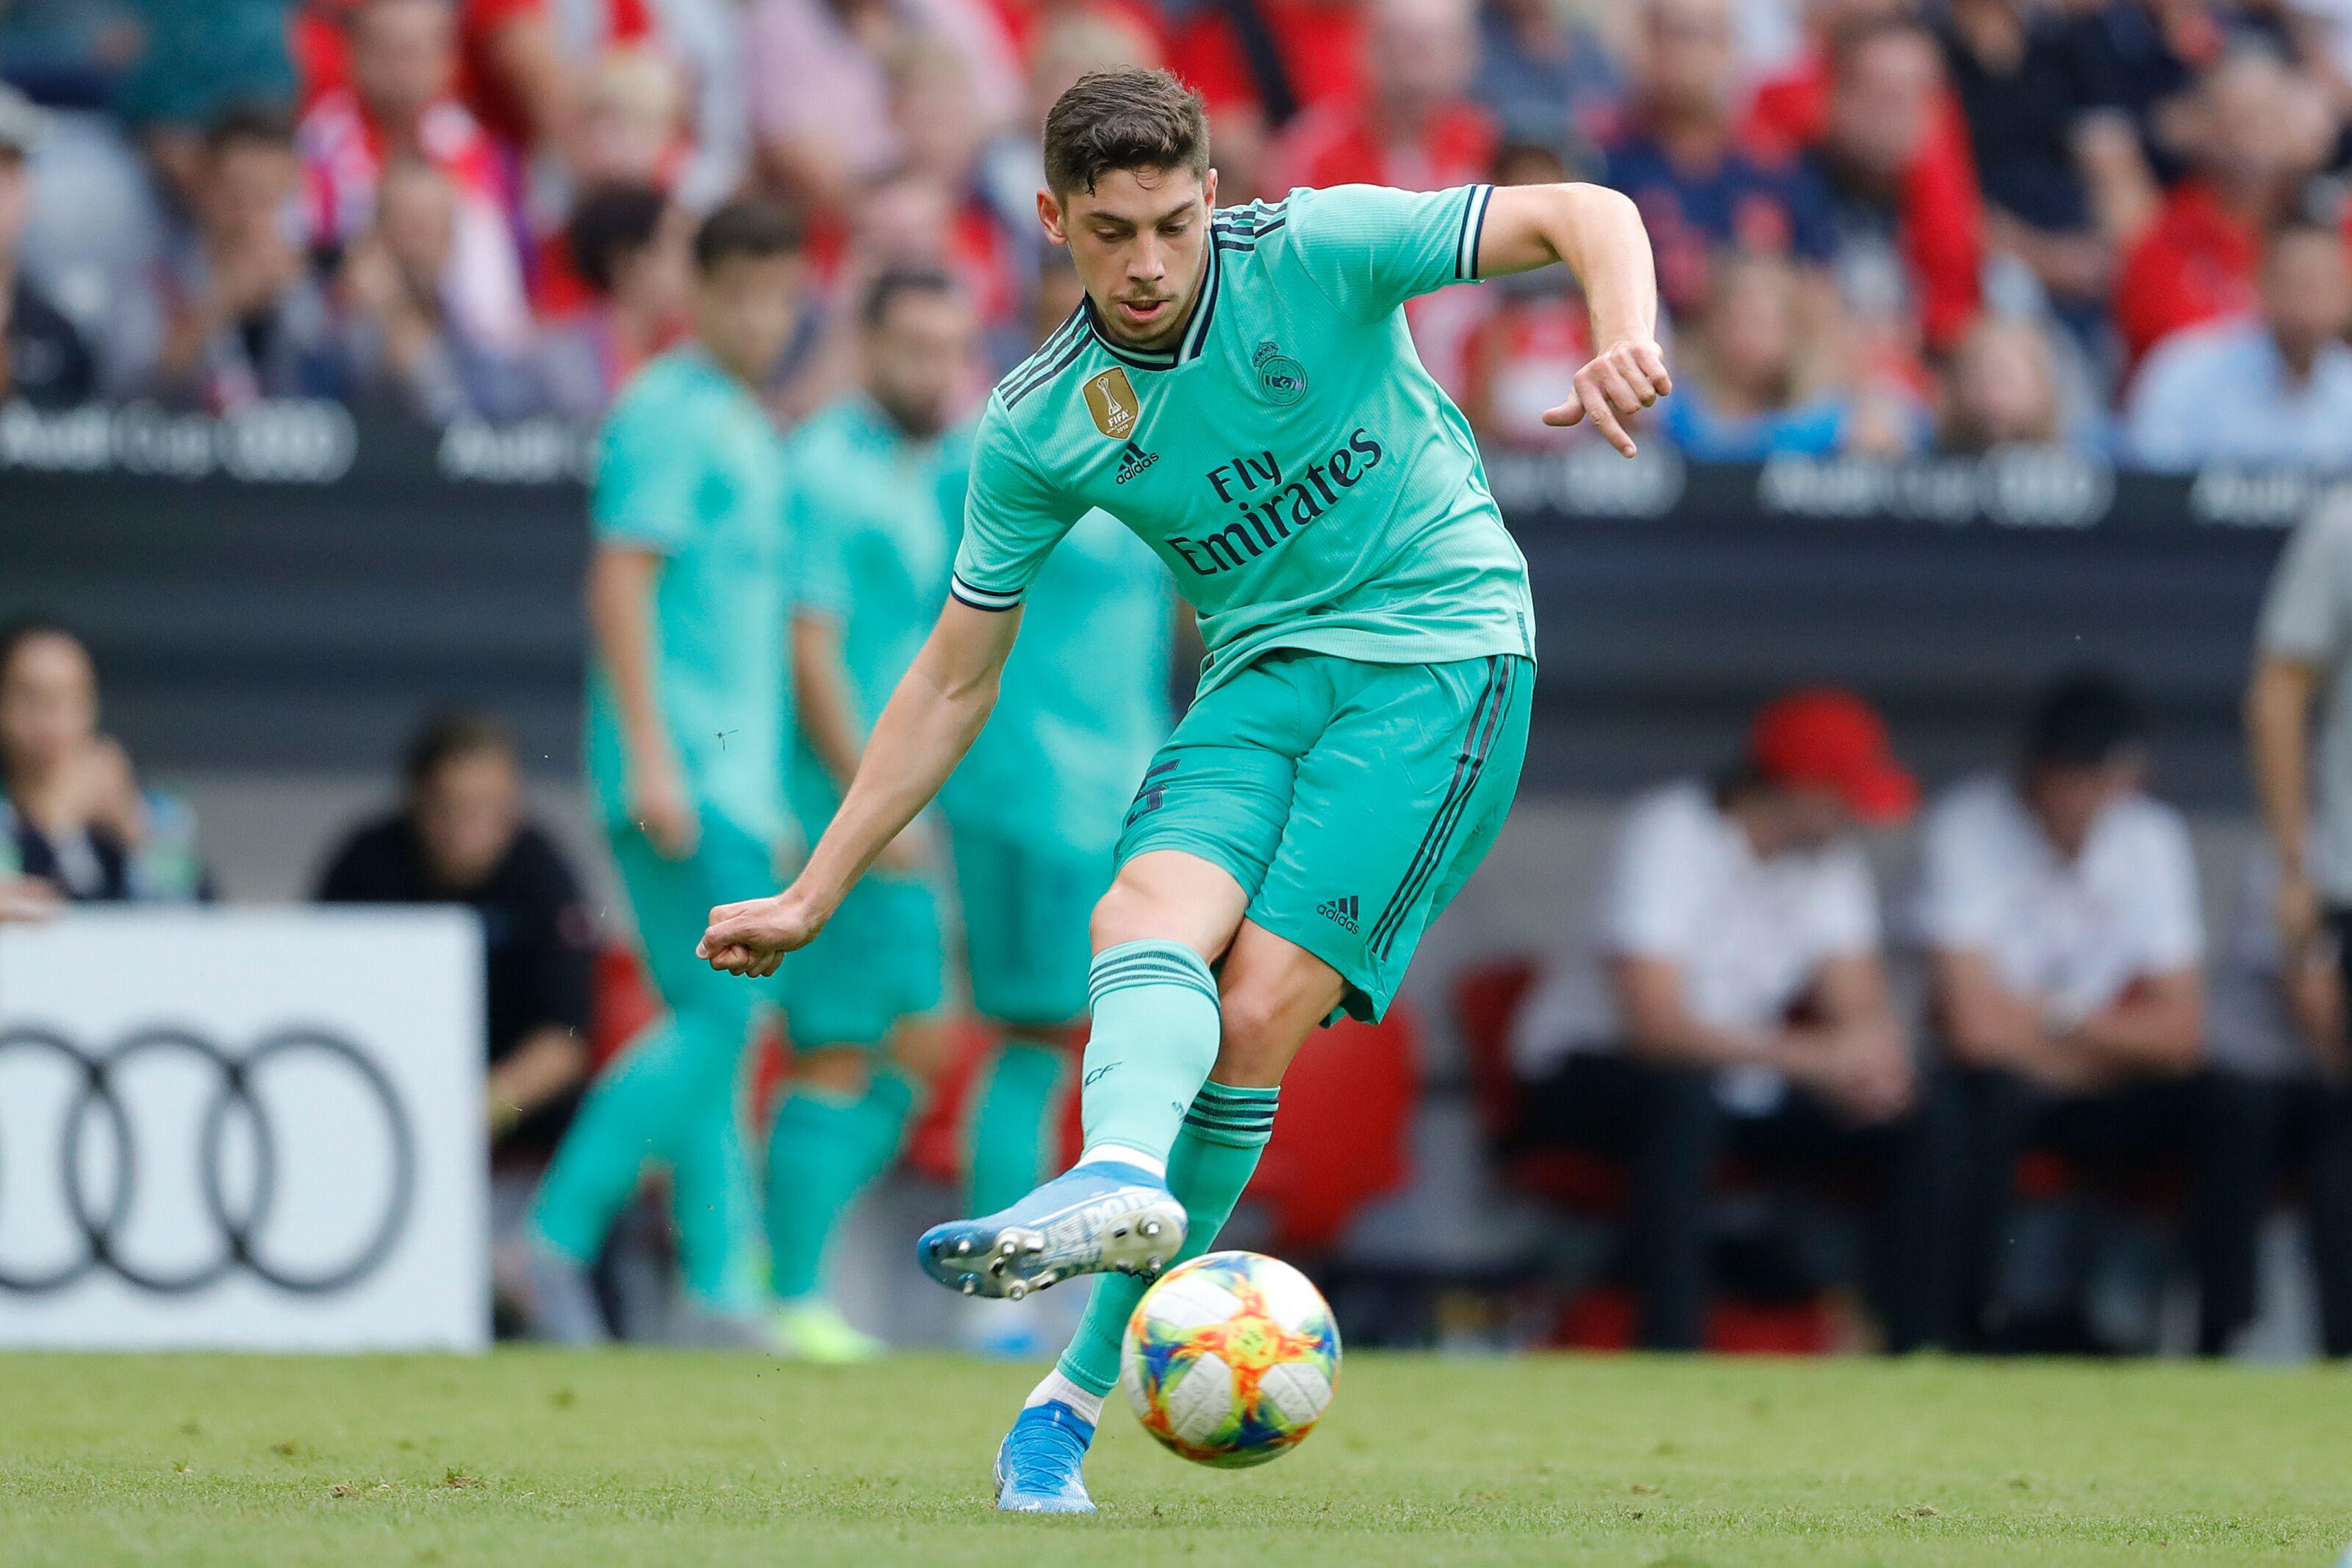 Real Madrid: Casemiro, Fede Valverde could form an elite partnership